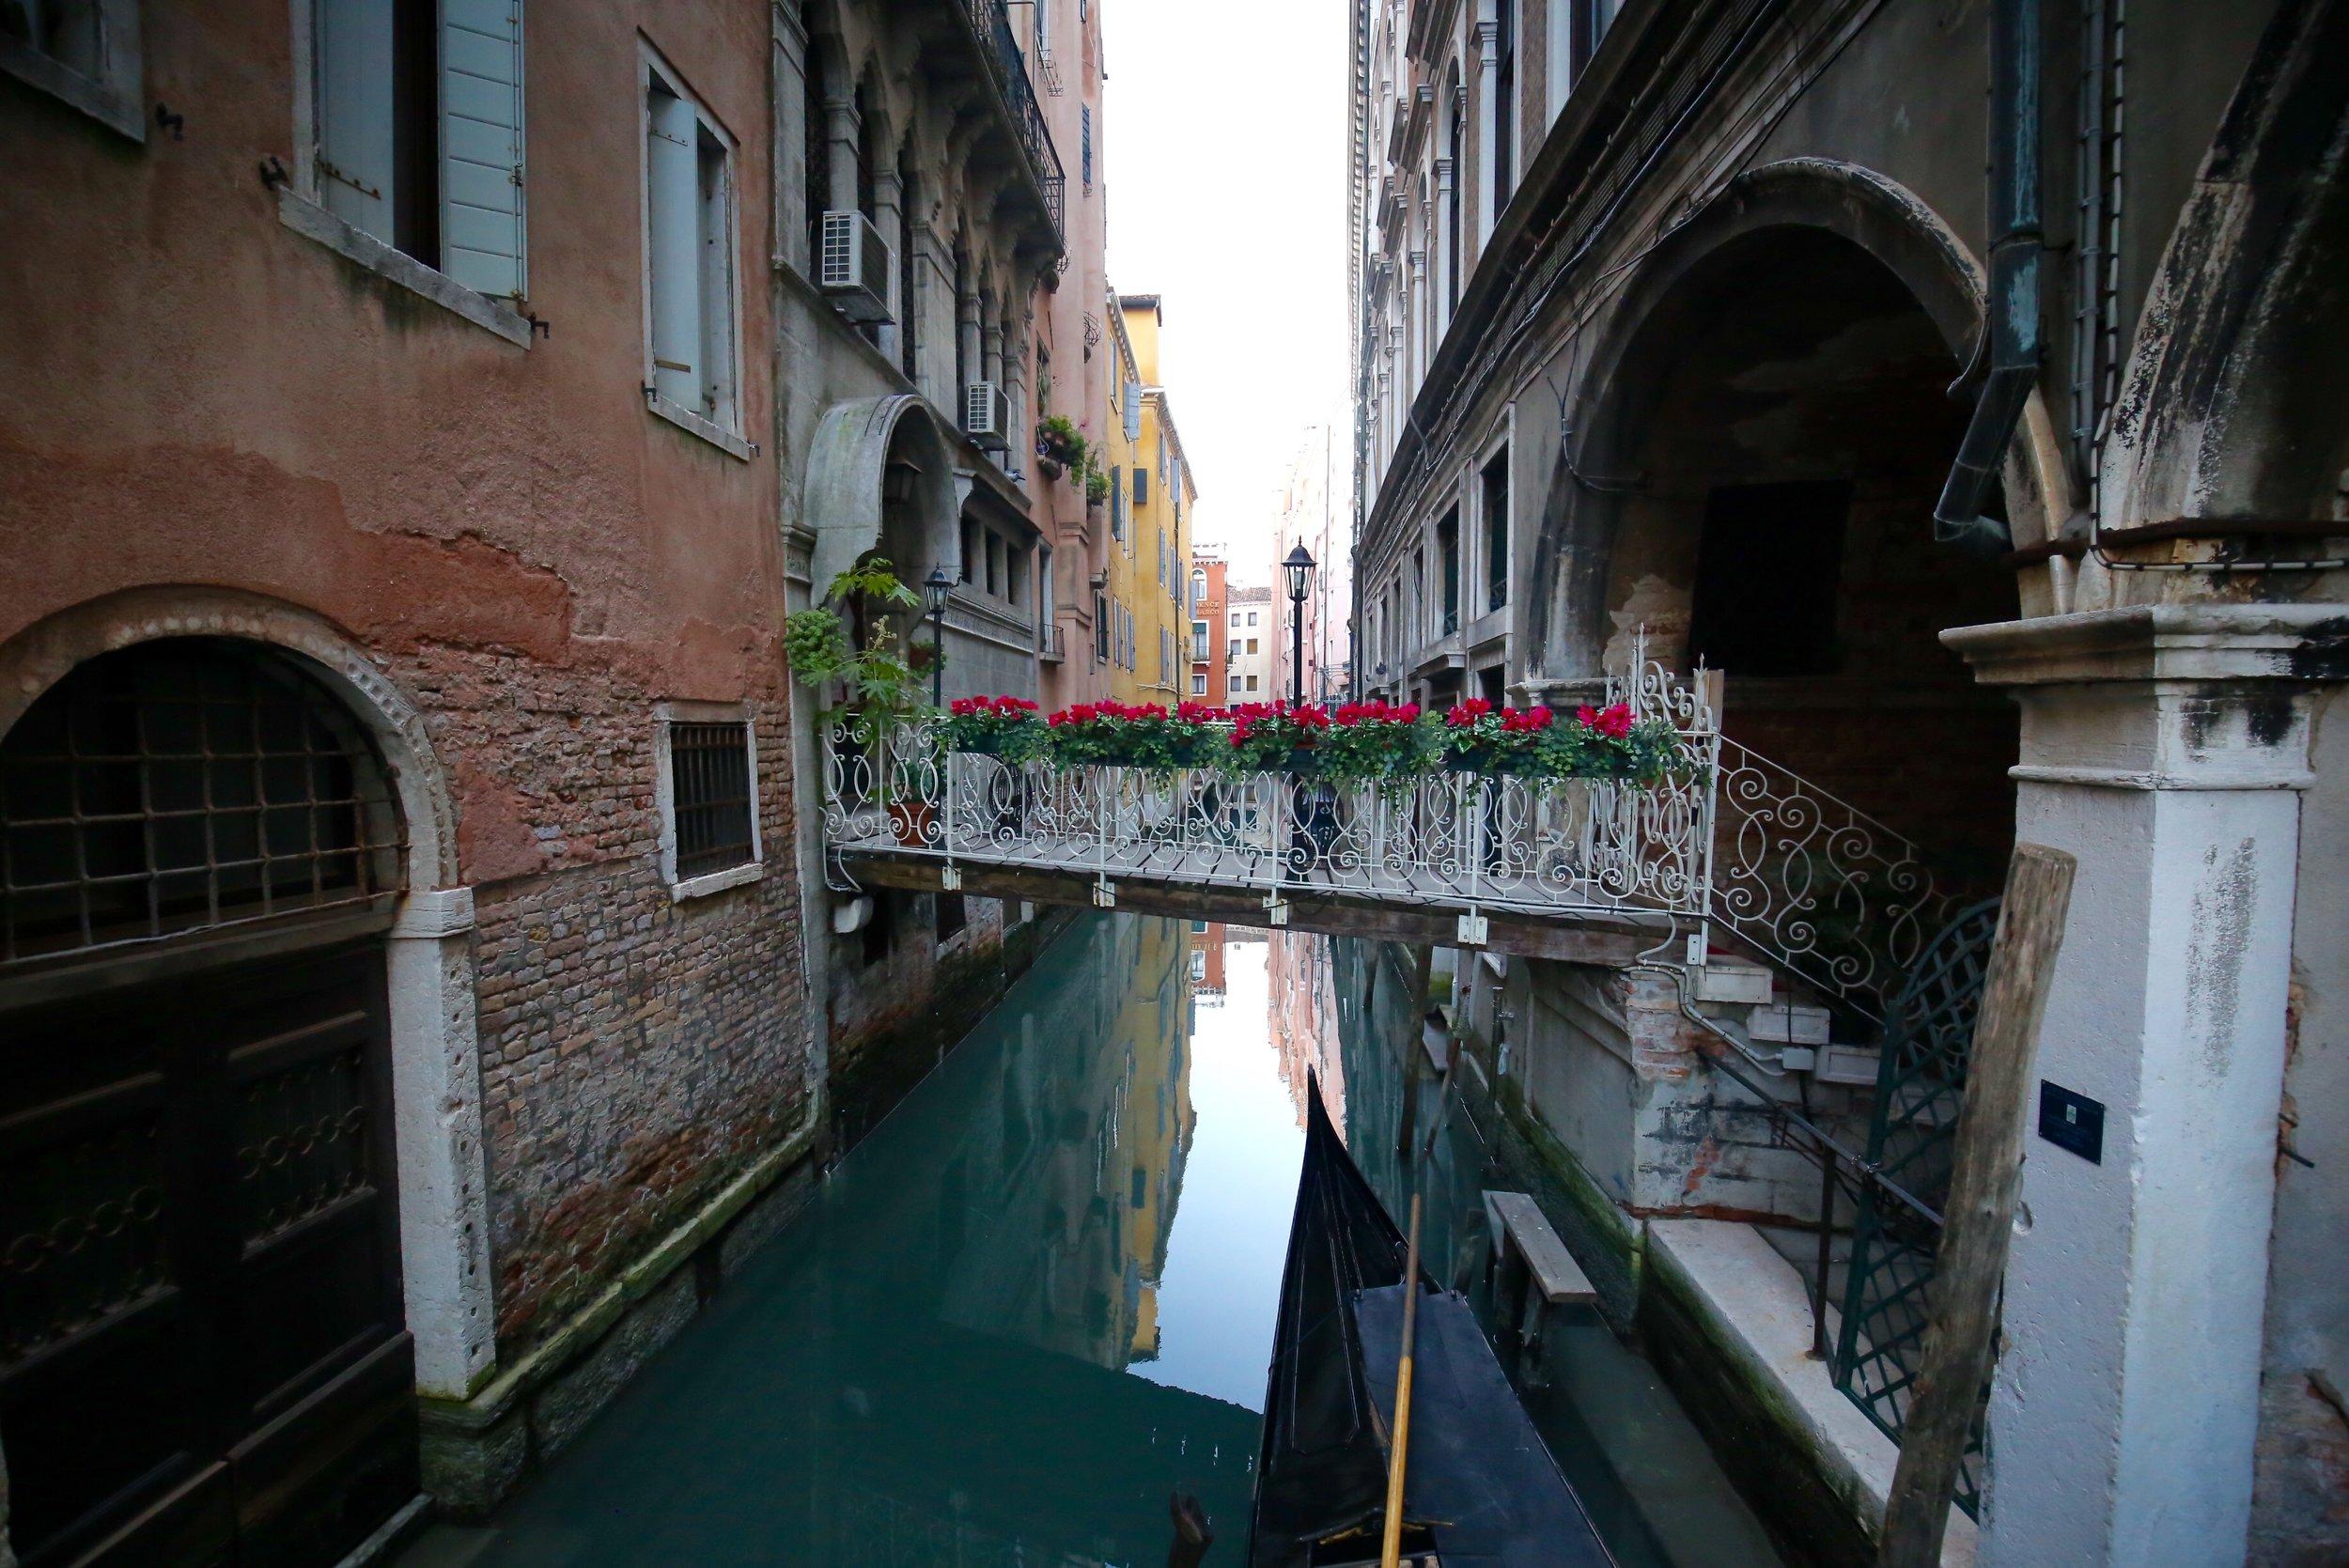 Blue canals and a small bridge with geranium flowerpots, a black gondola underneath, Venice.